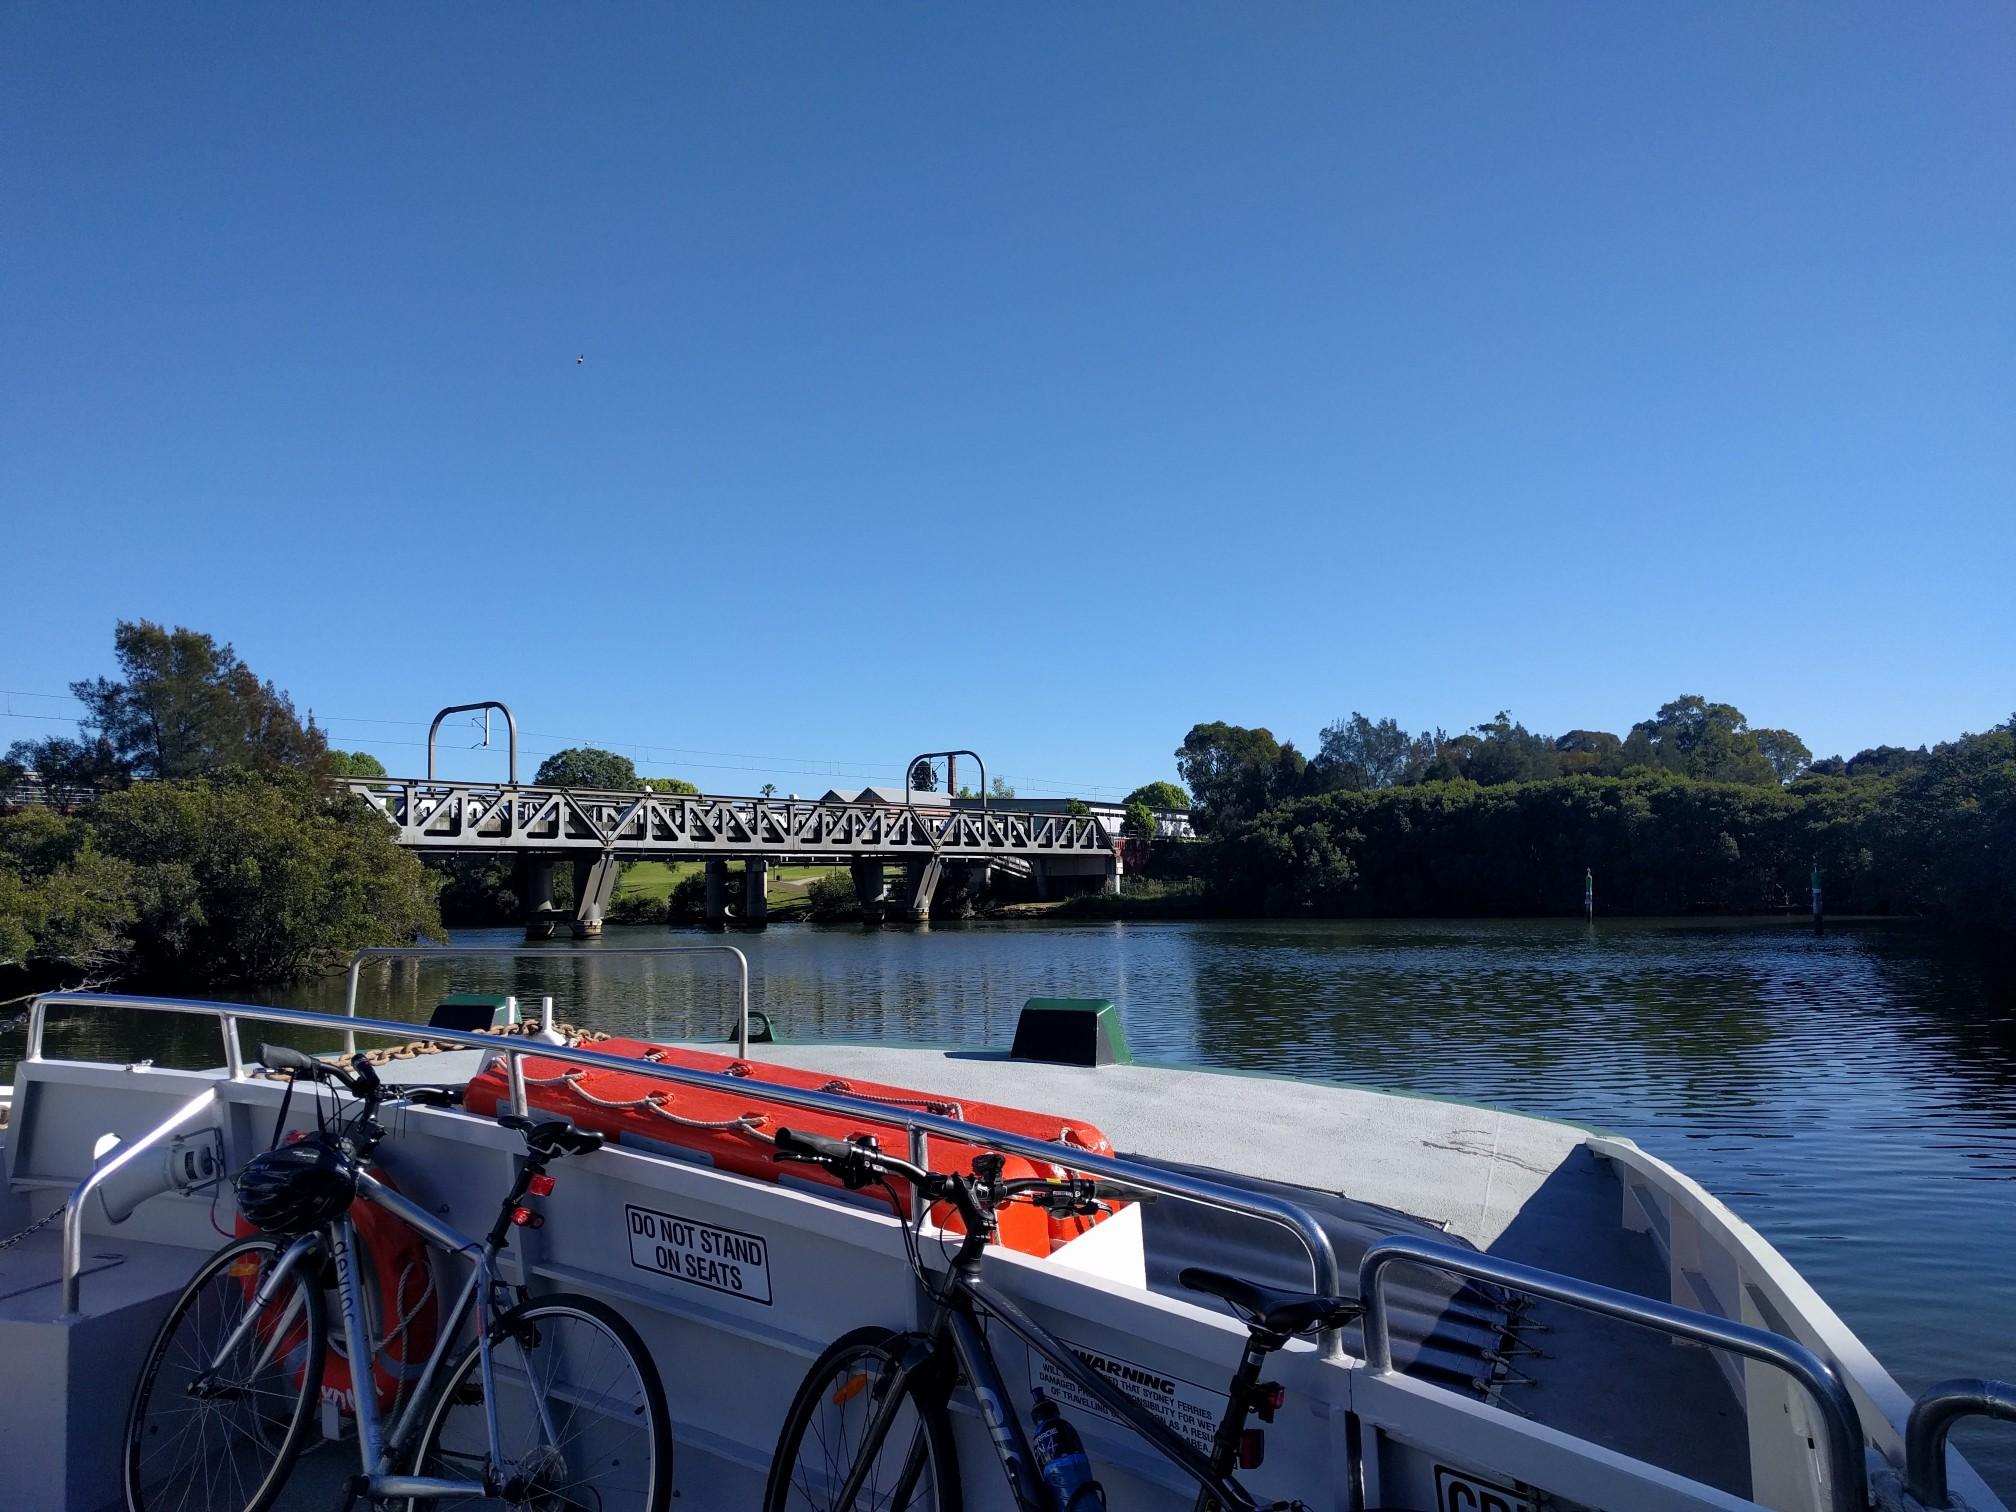 Parramatta Ferry adventures